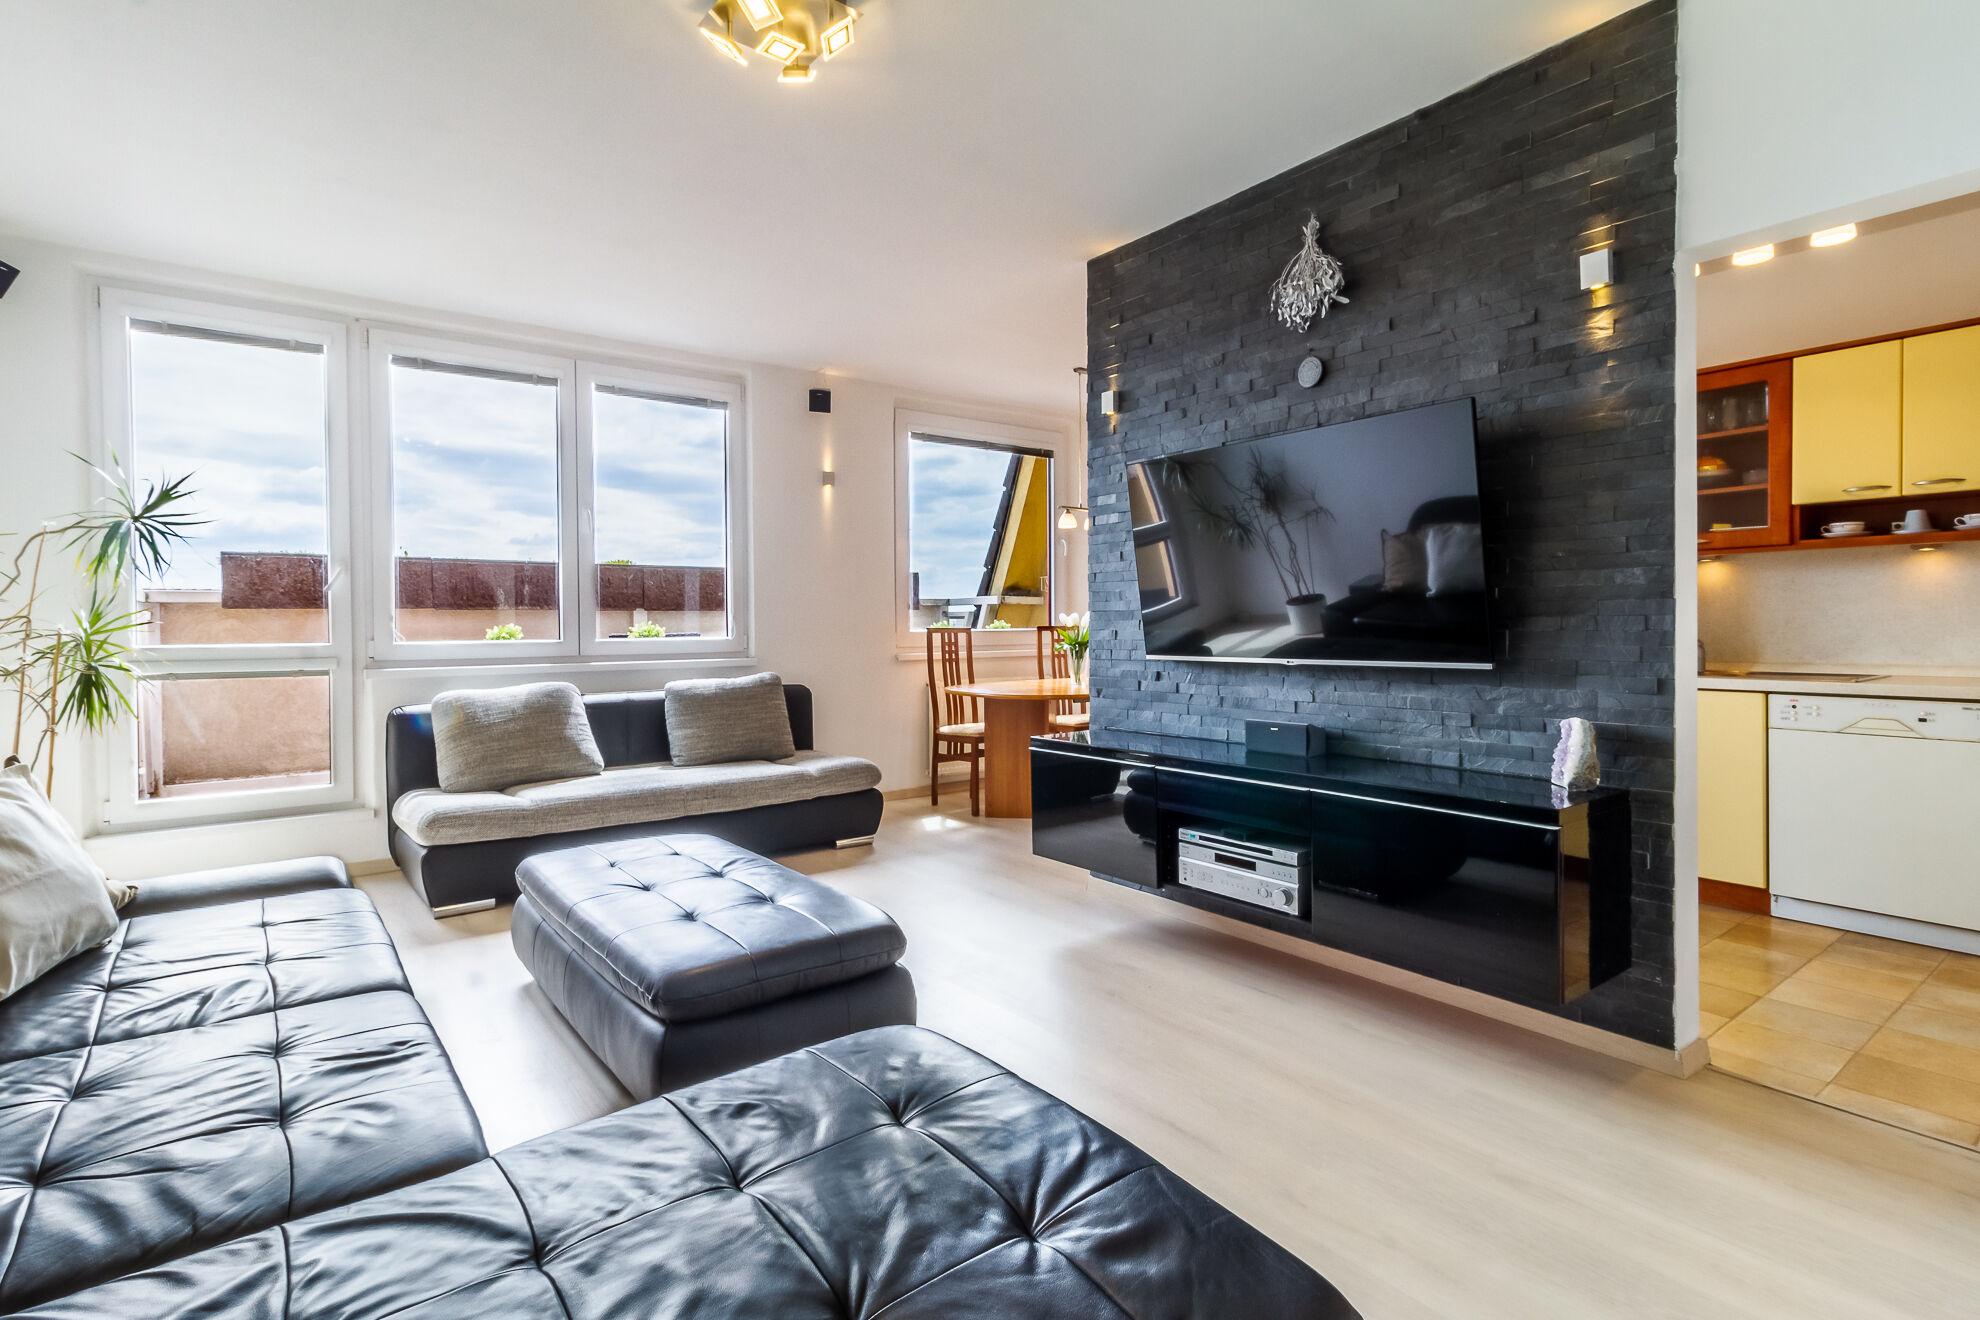 Prodej bytu 3+kk - 78 m², Praha 4 - Kunratice